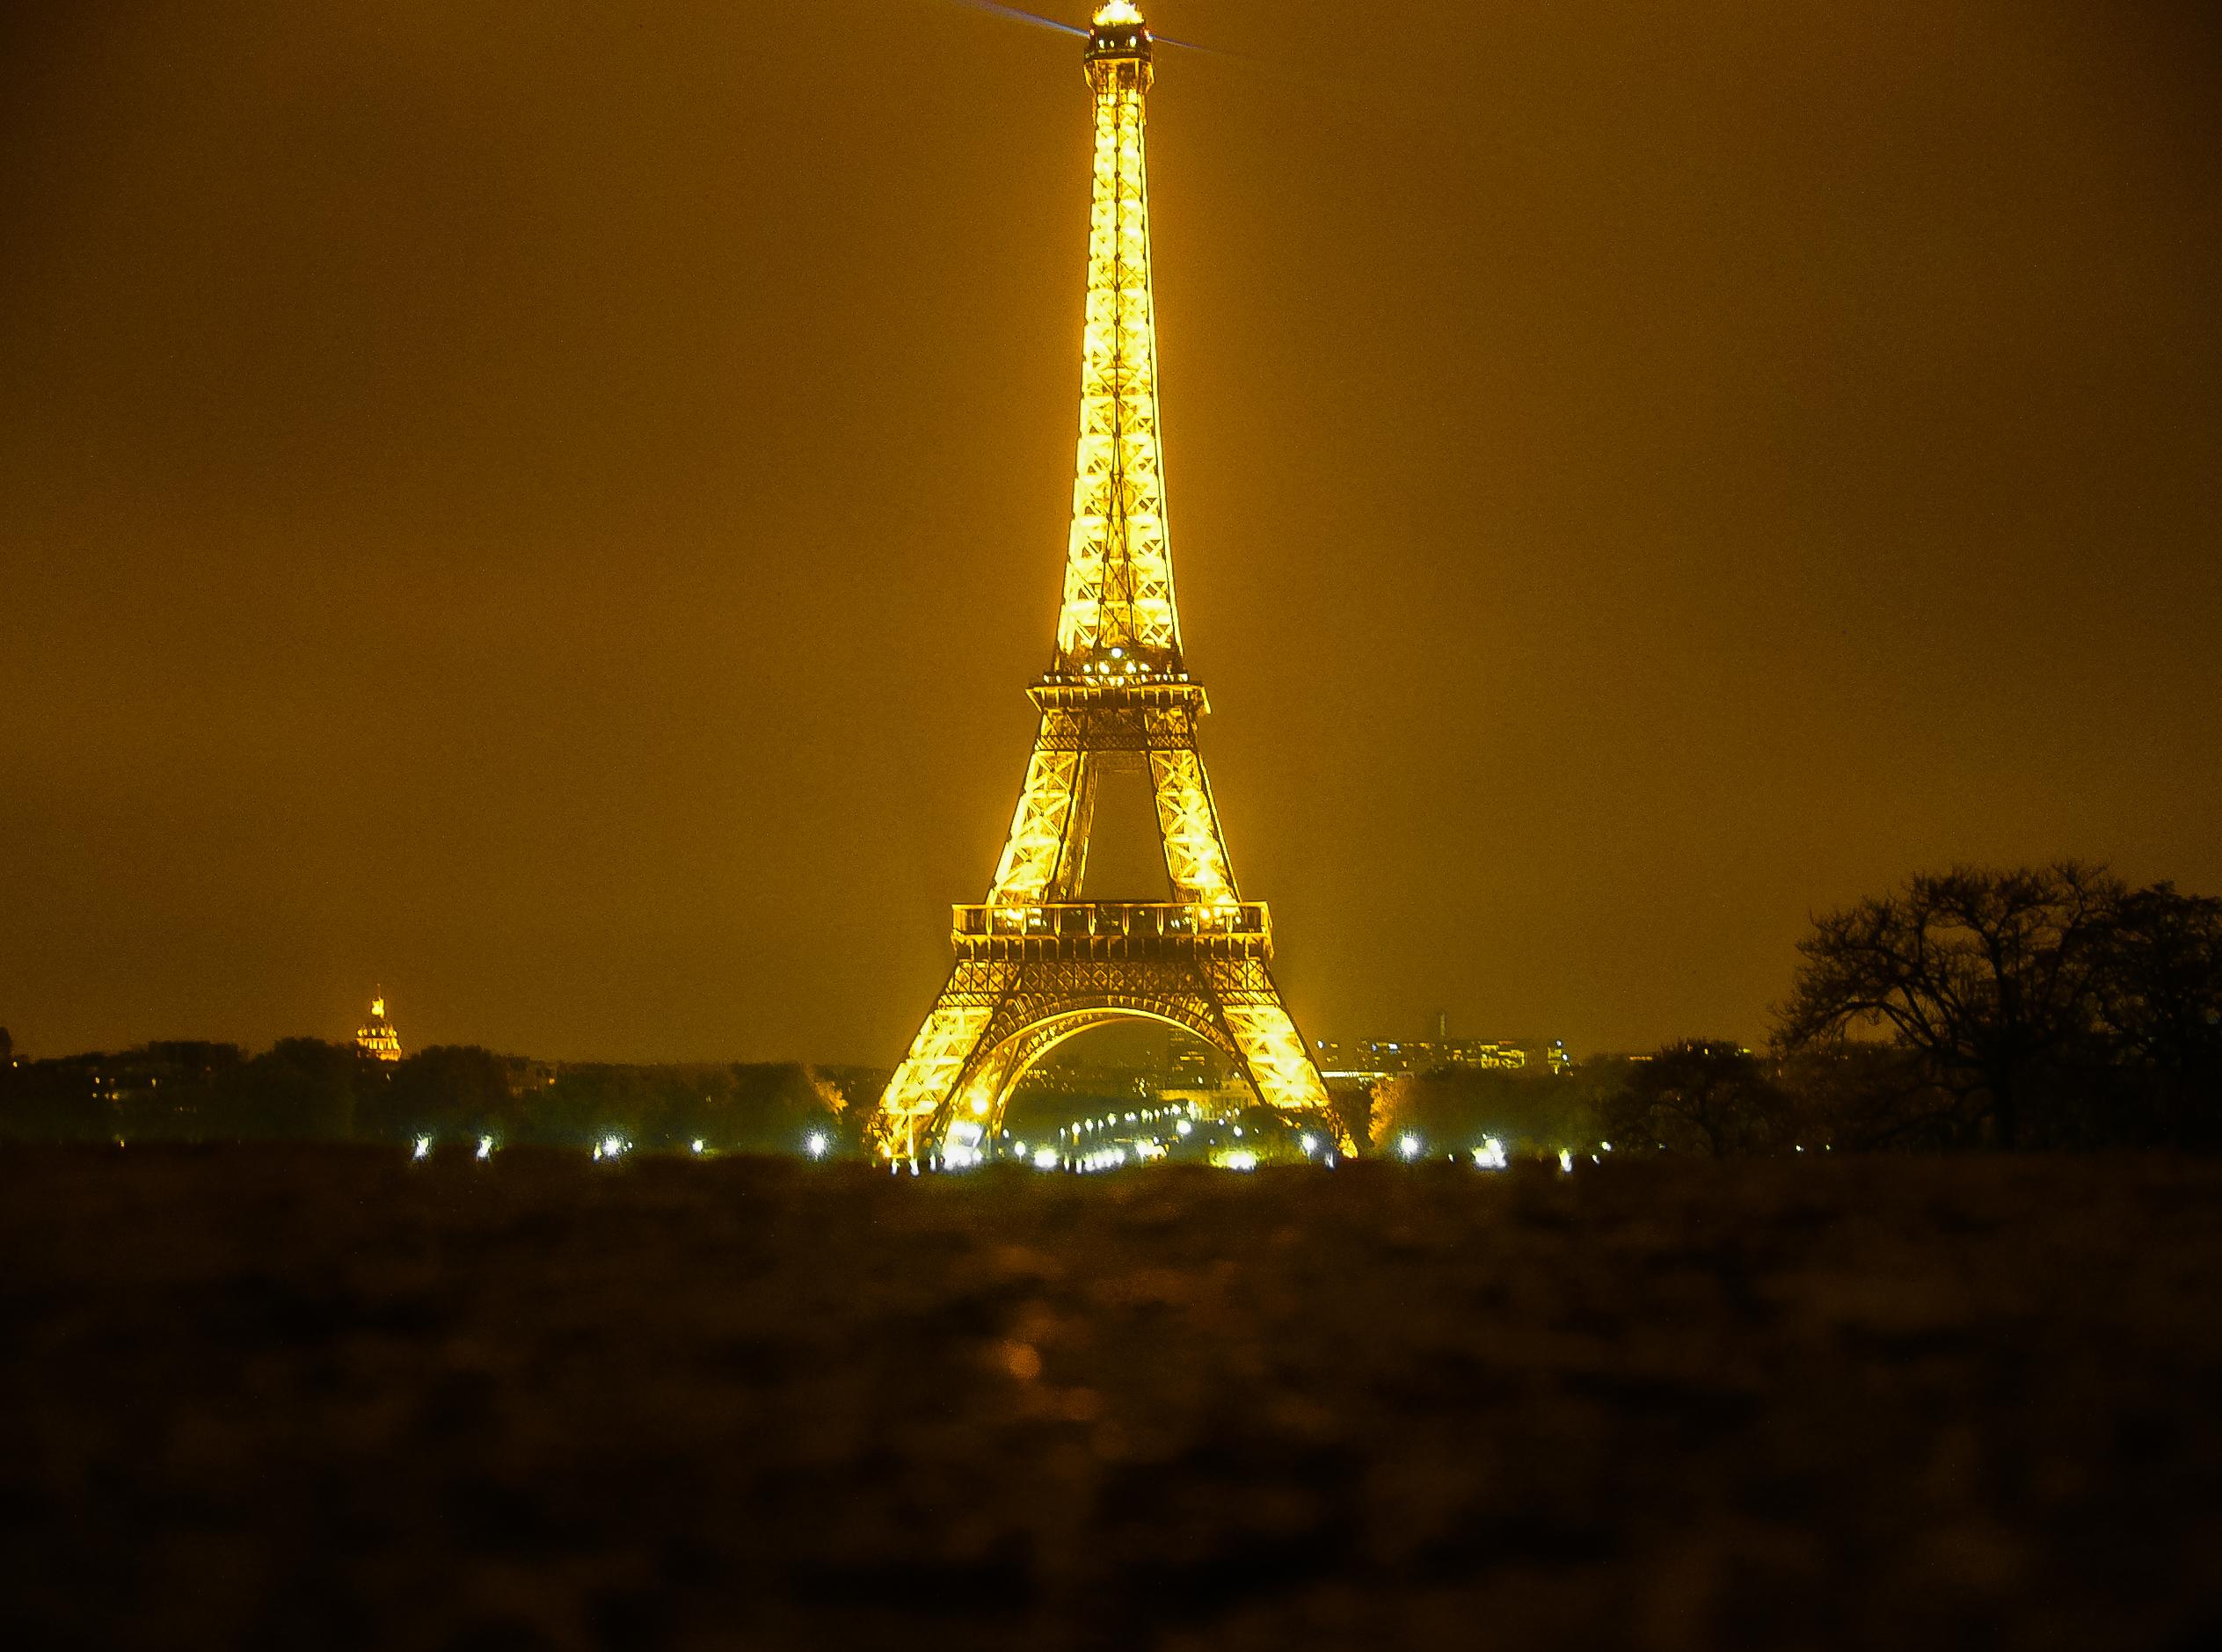 Wallpaper : Paris, tower, night, torre, tour, eiffel, gastone ...